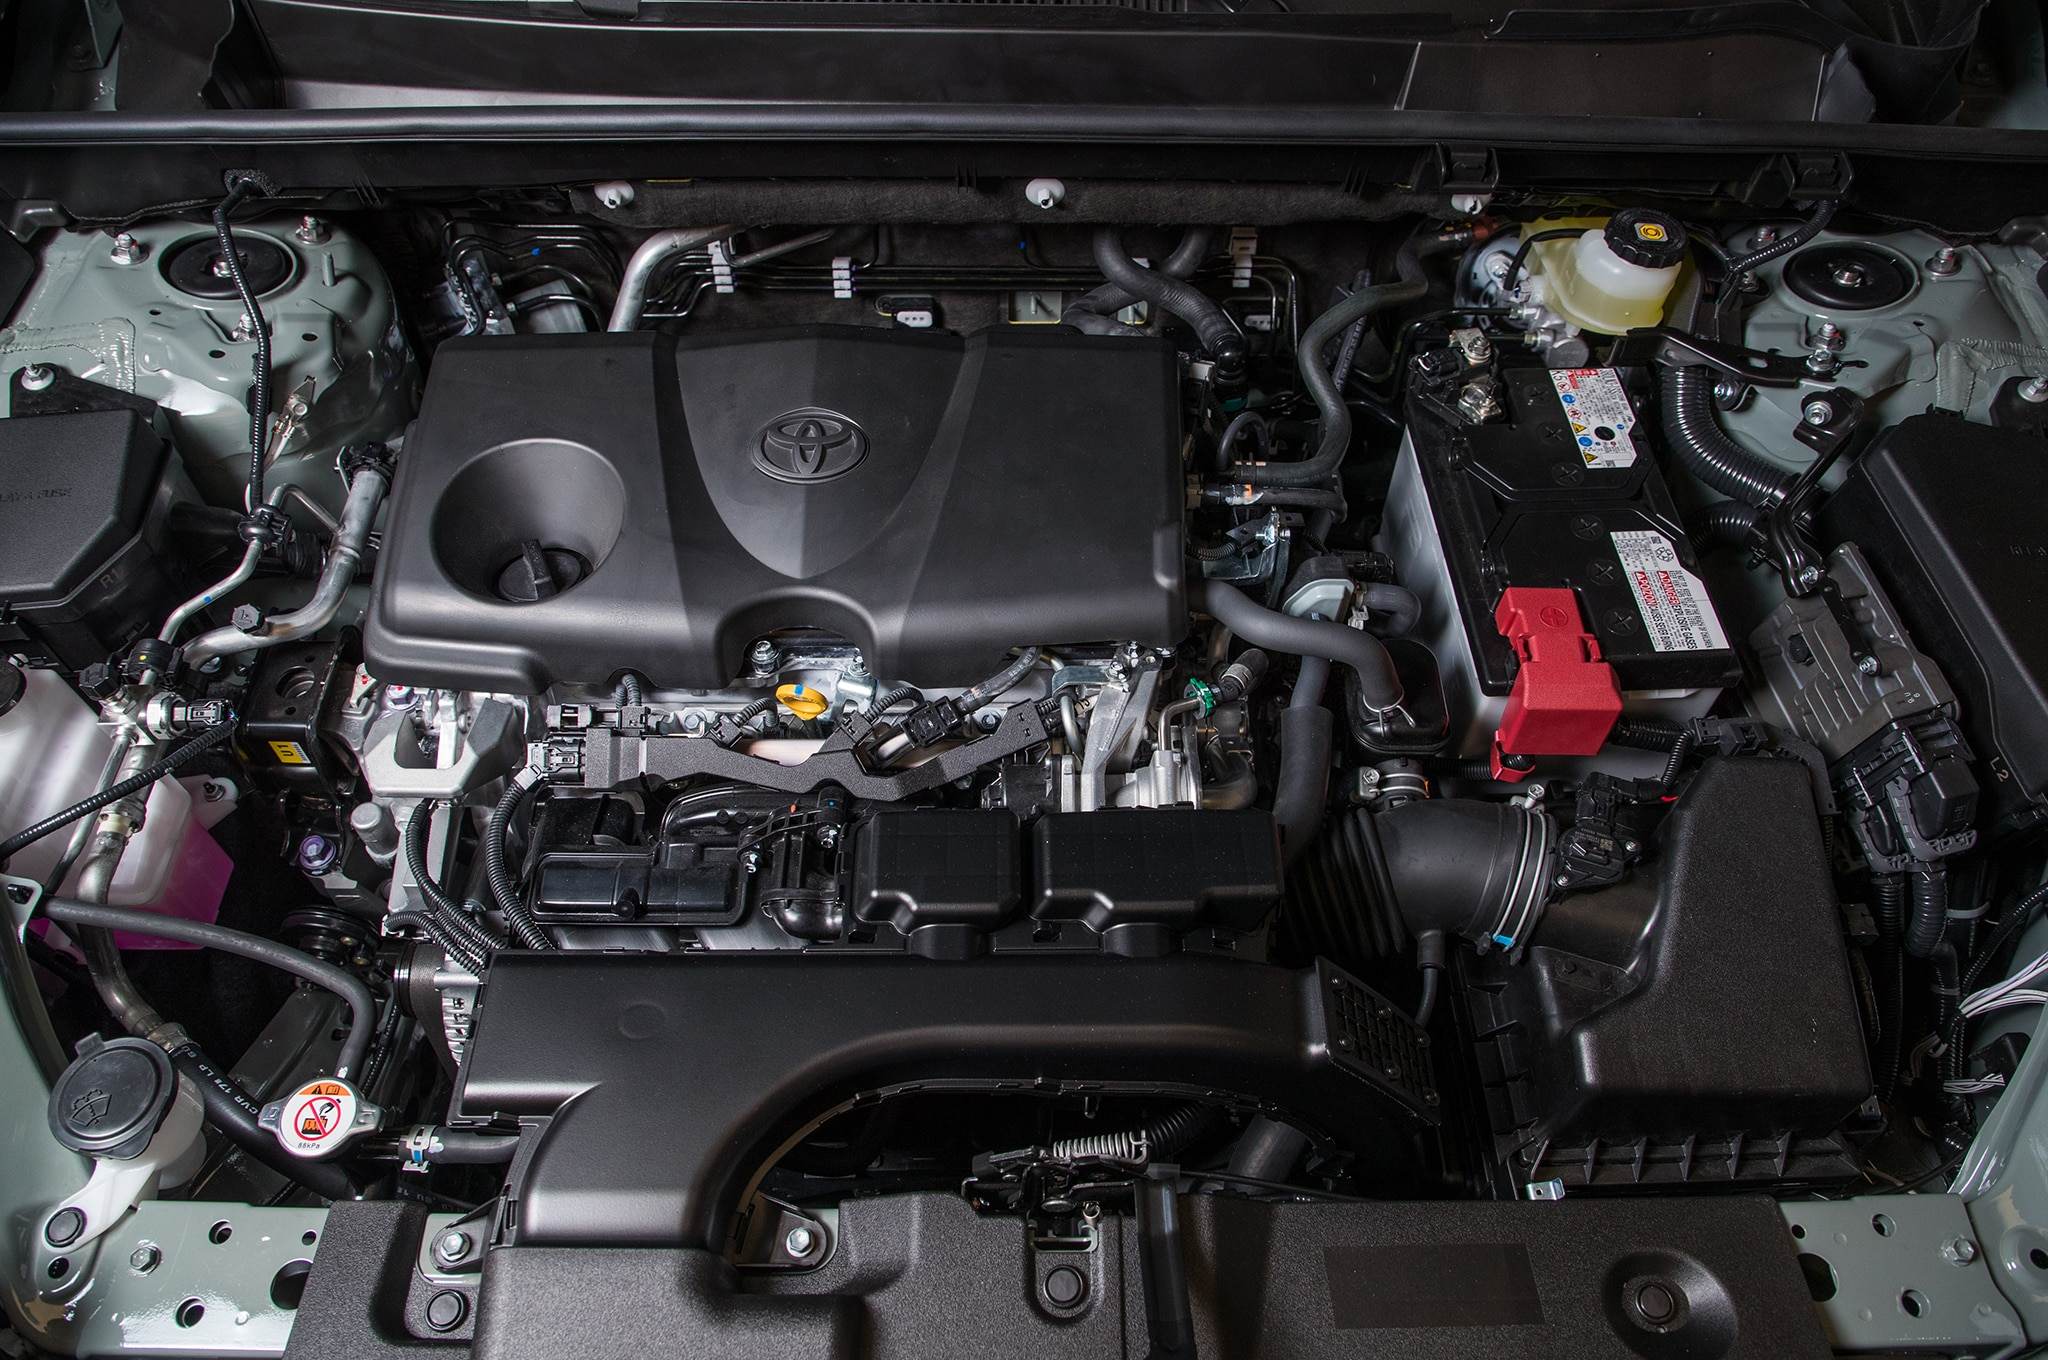 2019 Toyota Rav4 Engine 02 1 2 Abril 2018 Miguel Cortina